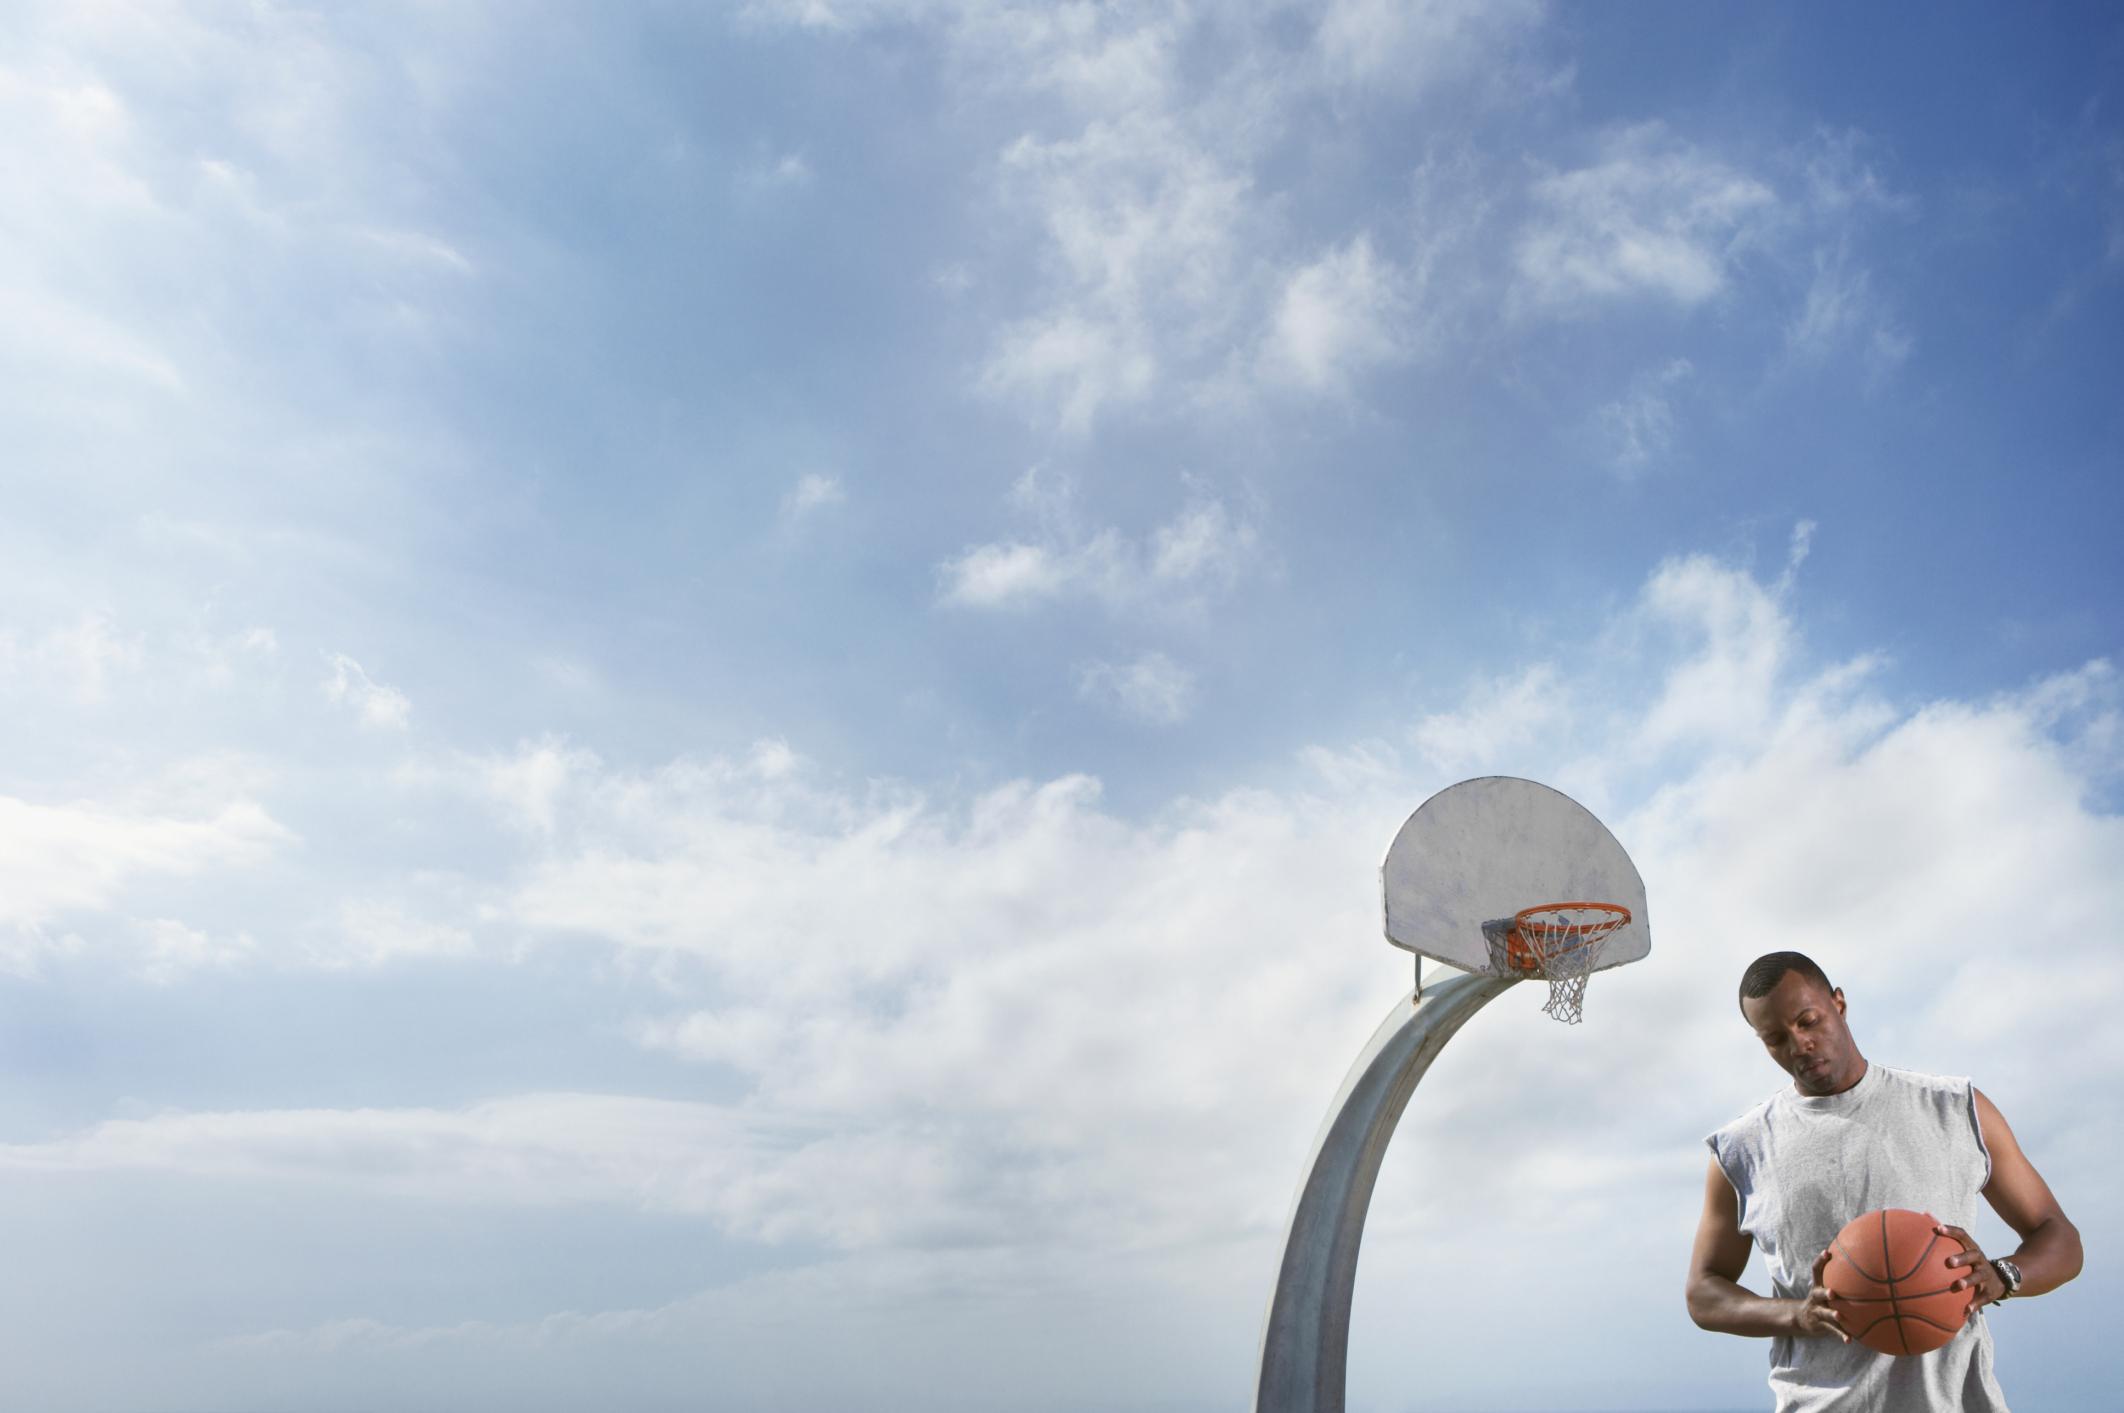 Spanish Subject Pronouns Worksheet Excel Basketball  The Skeletal System  Livestrongcom Interger Worksheet Pdf with More Than And Less Than Worksheets For Kindergarten  Ruby Bridges Worksheets Pdf